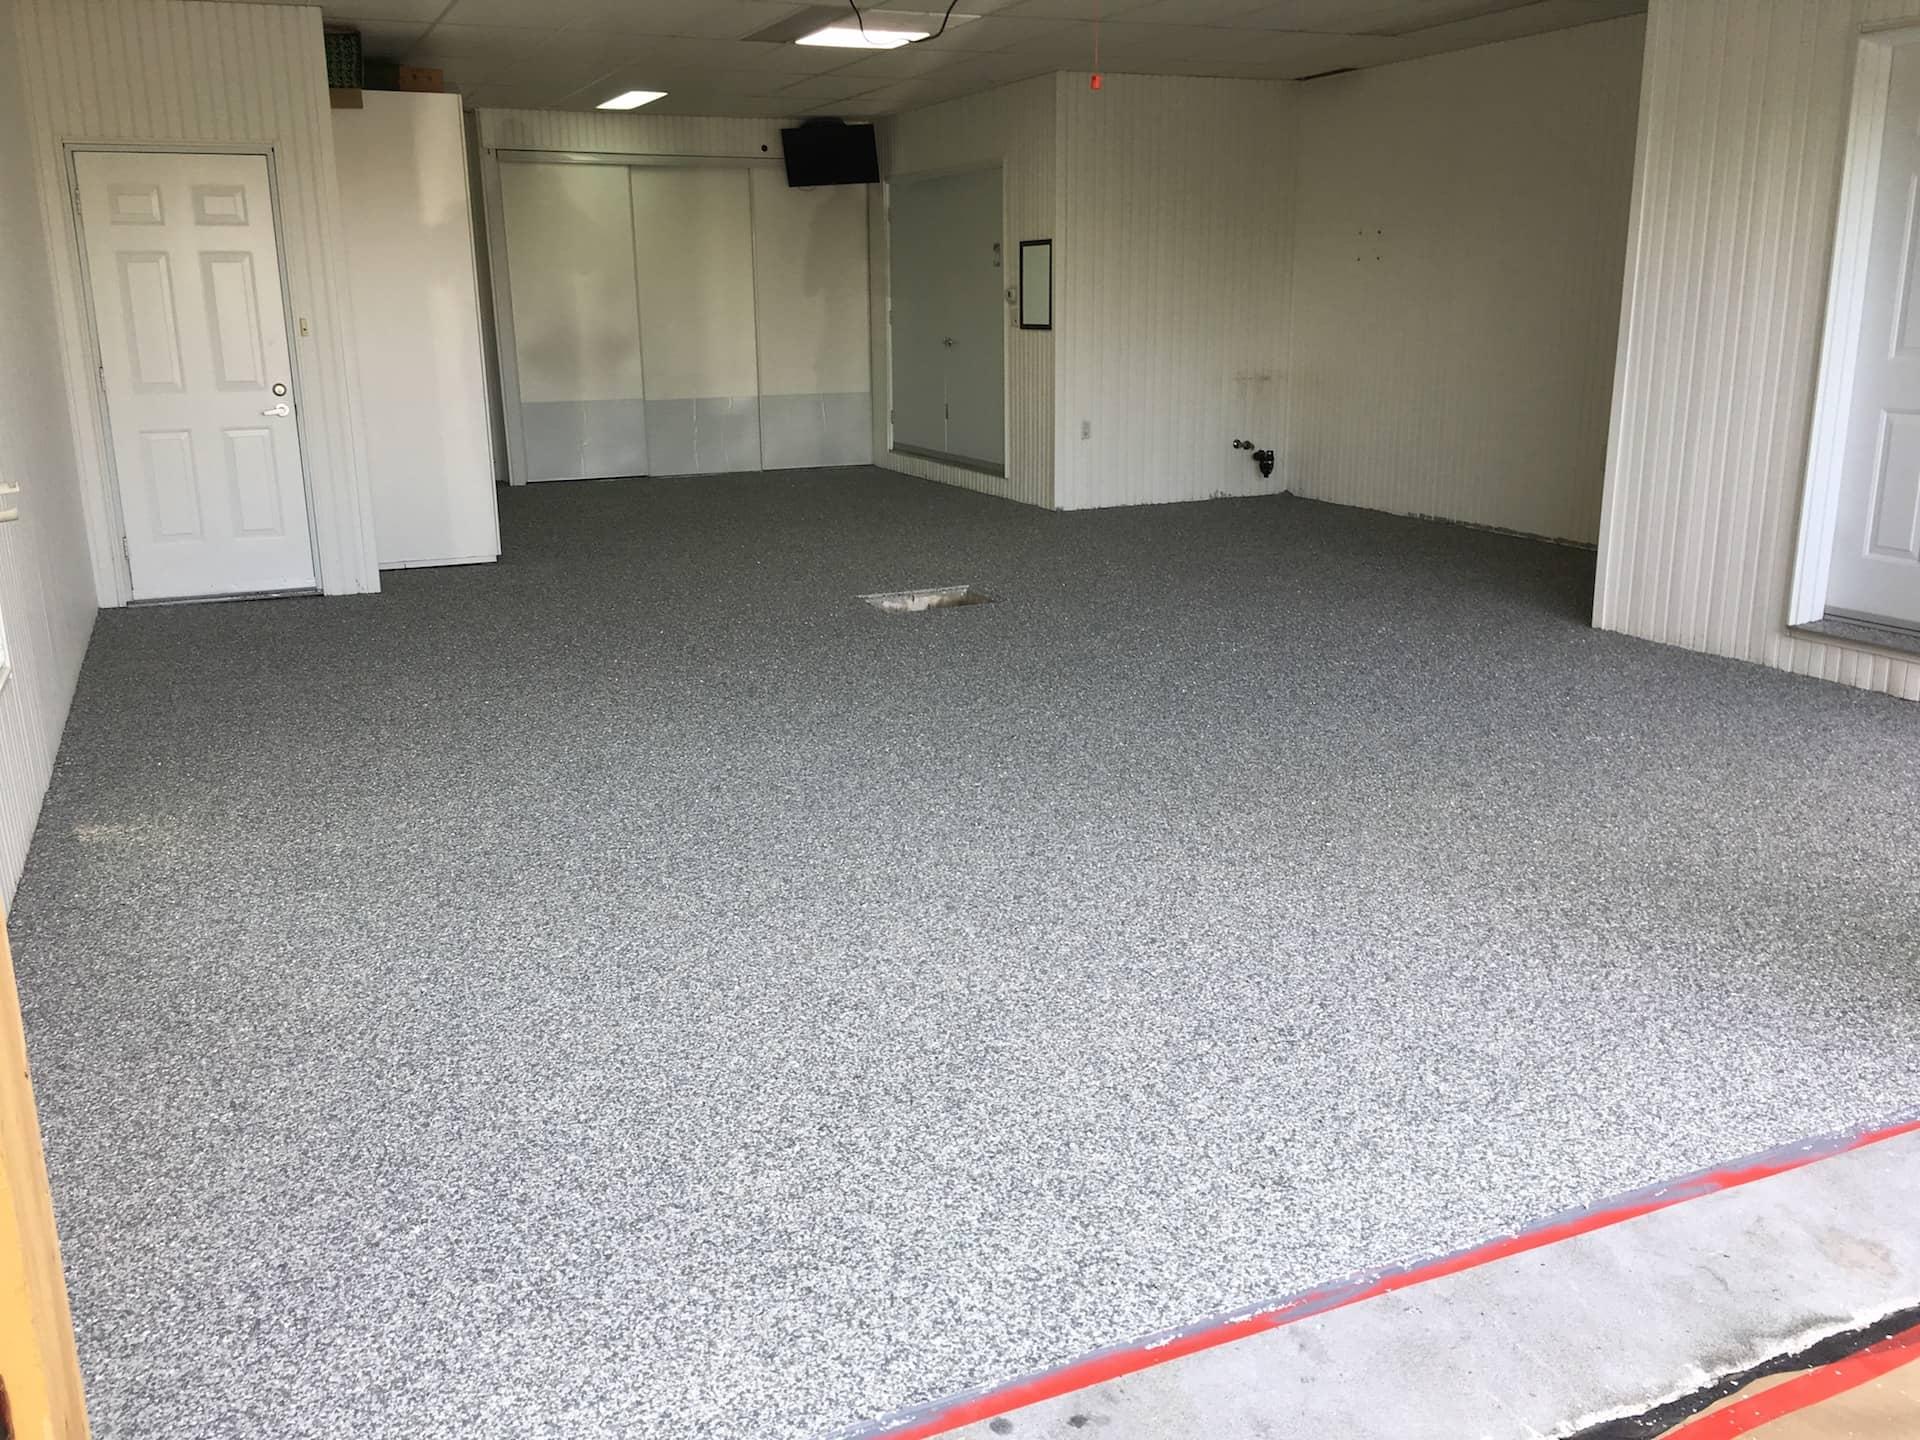 plancher de garage en époxy